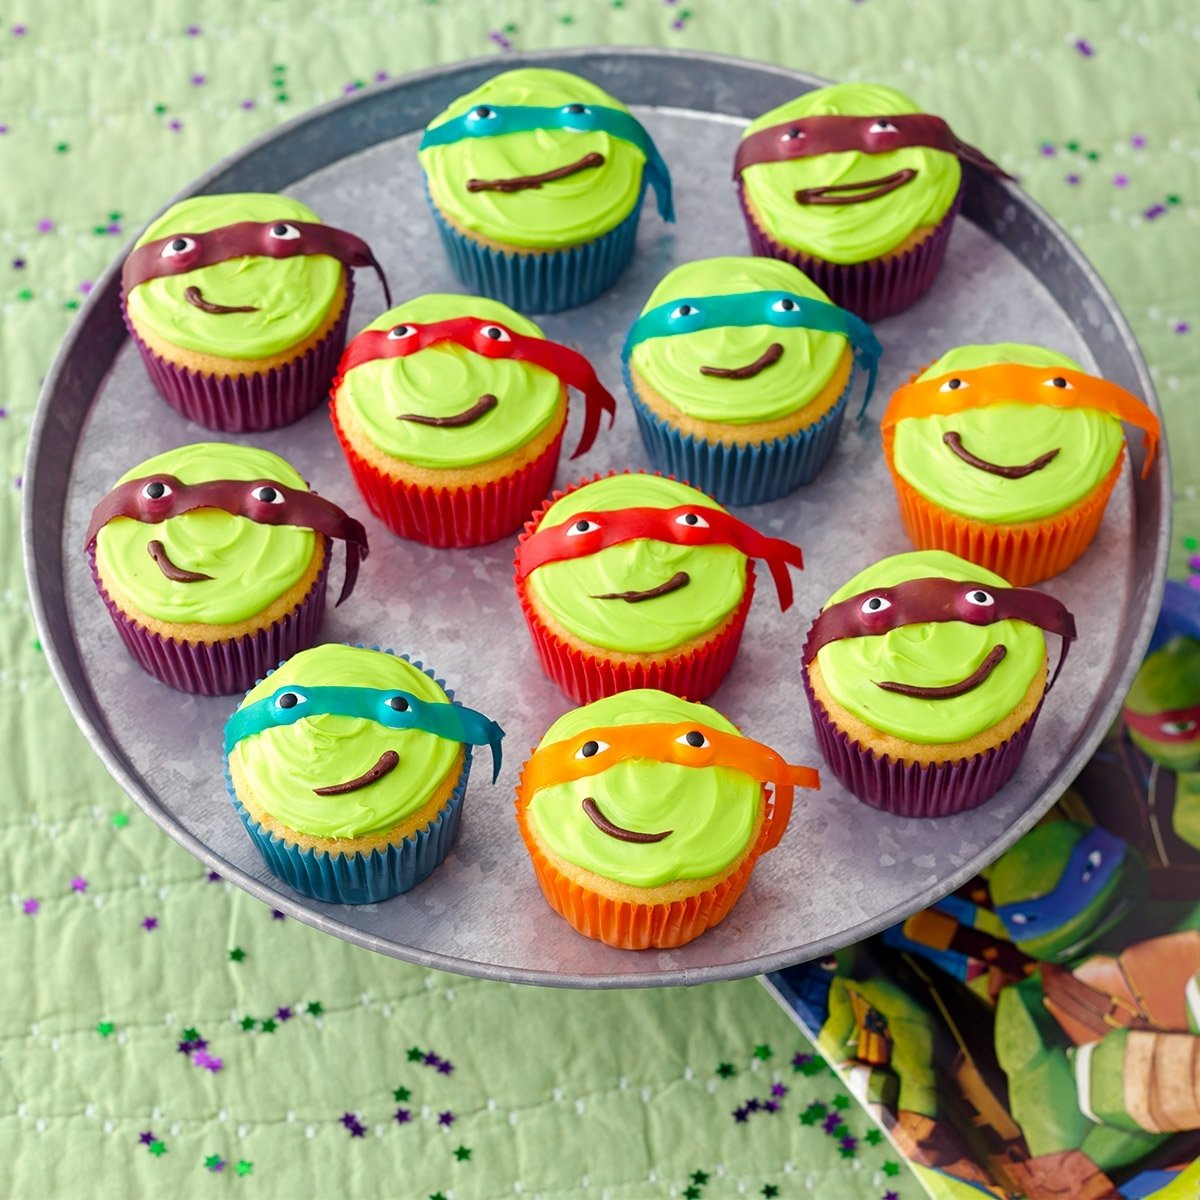 10 Attractive Teenage Mutant Ninja Turtles Cupcake Ideas 5 easy tmnt treats nickelodeon parents